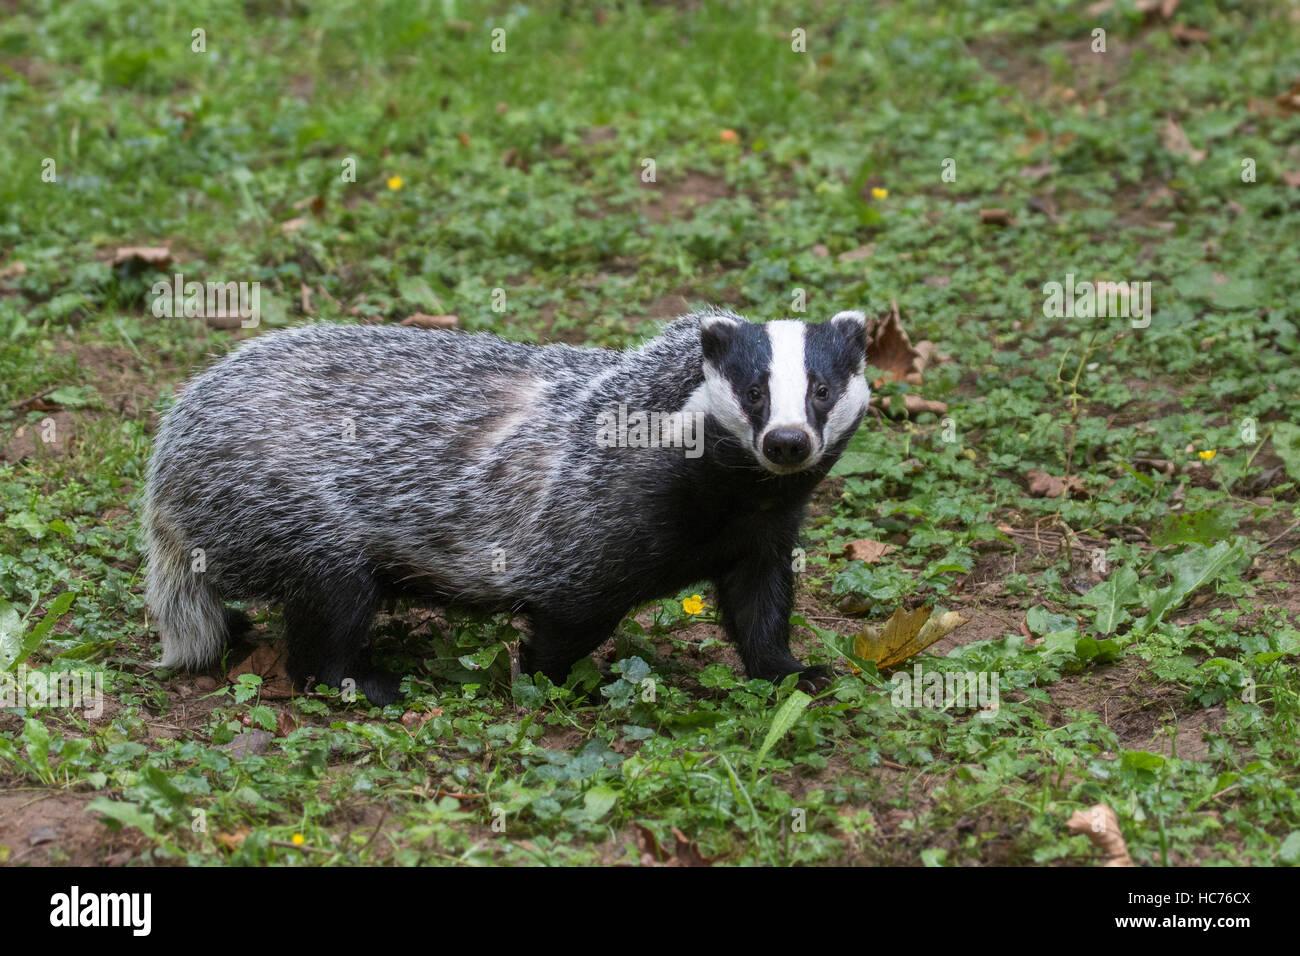 European badger (Meles meles) foraging in grassland during the daytime - Stock Image